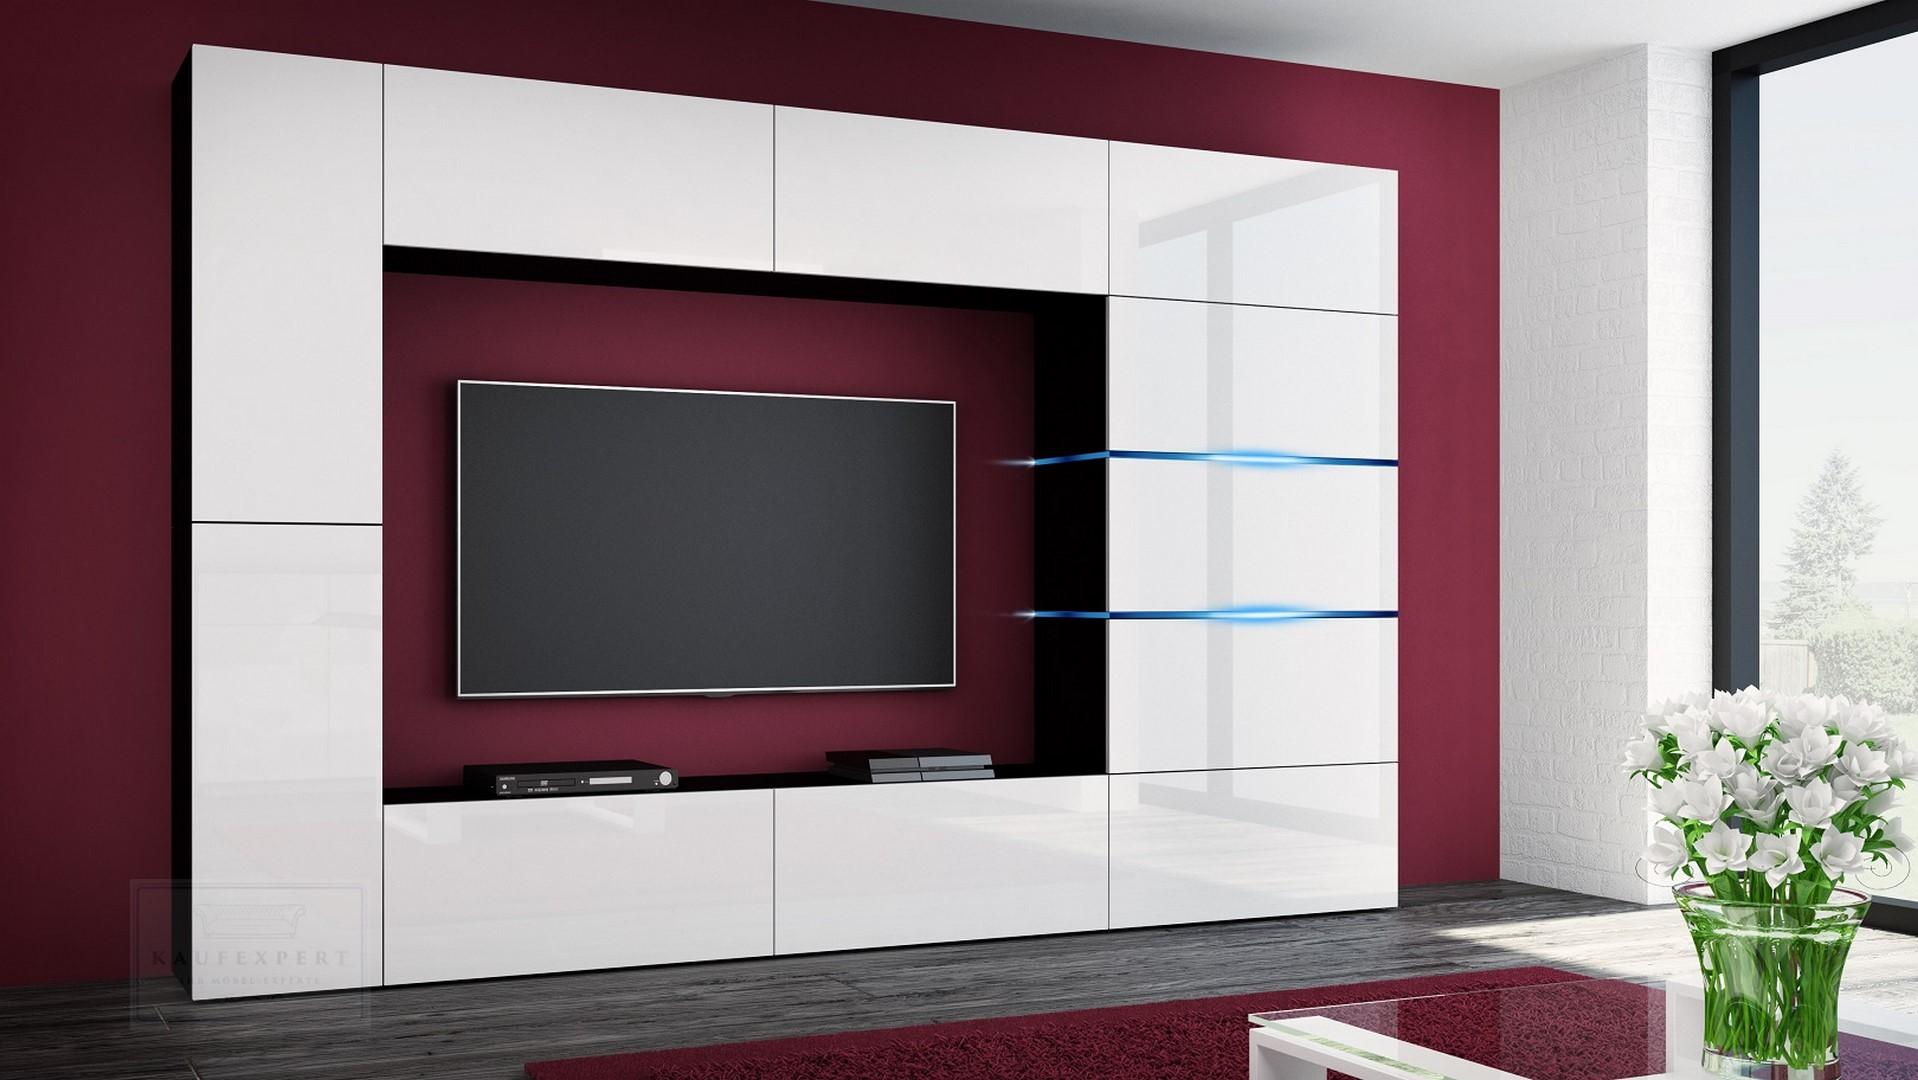 Wohnwand Shadow Weiß Hochglanz Schwarz 285 Cm Mediawand Anbauwand Medienwand Design Modern Led Beleuchtung Mdf Hochglanz Stehend Tv Wand